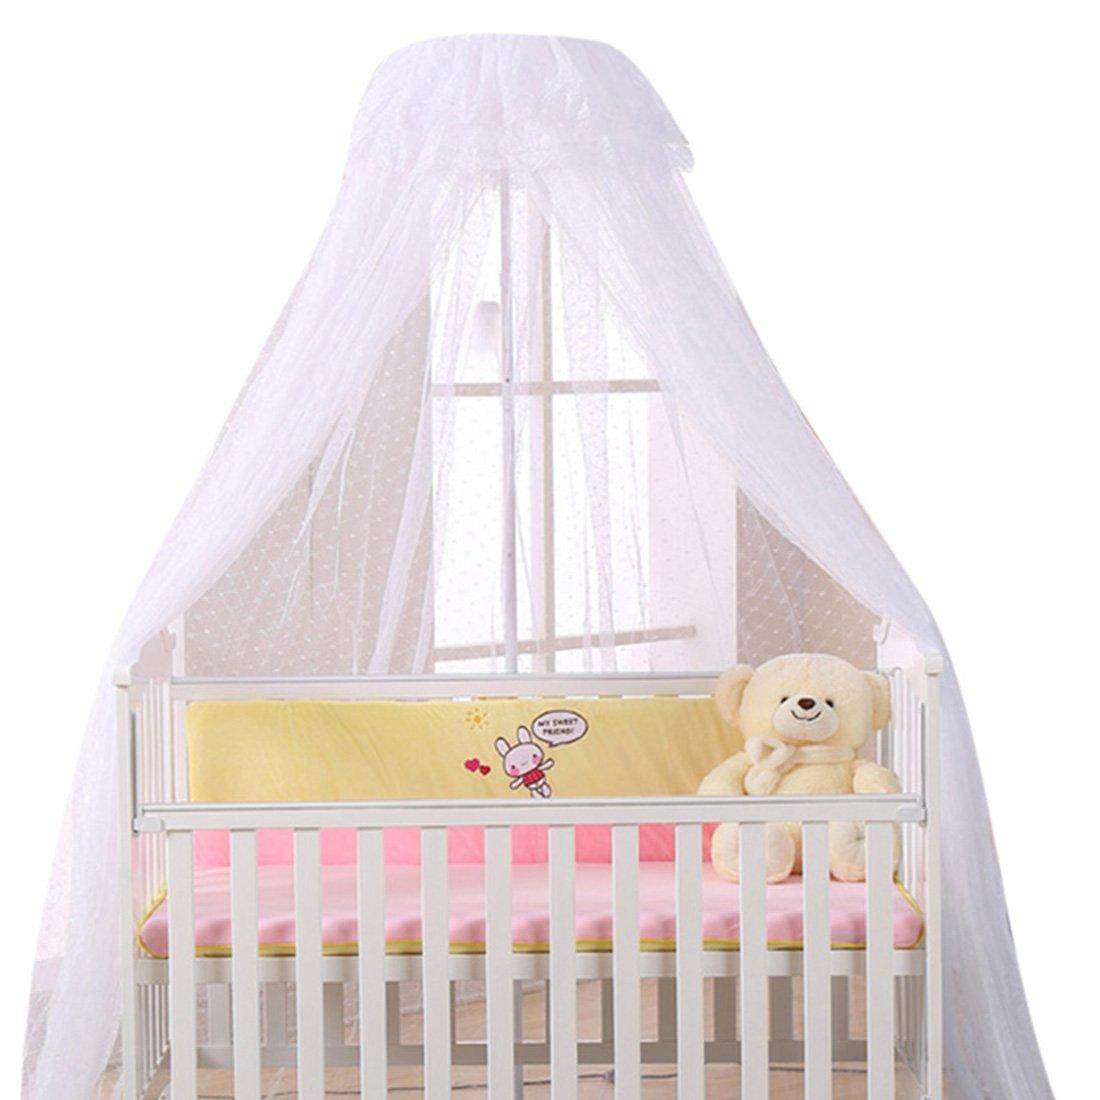 Jiyaru Baby Mosquito Net Lace Dome Nursery Netting Toddler Bed Crib Canopy White Net + Holder